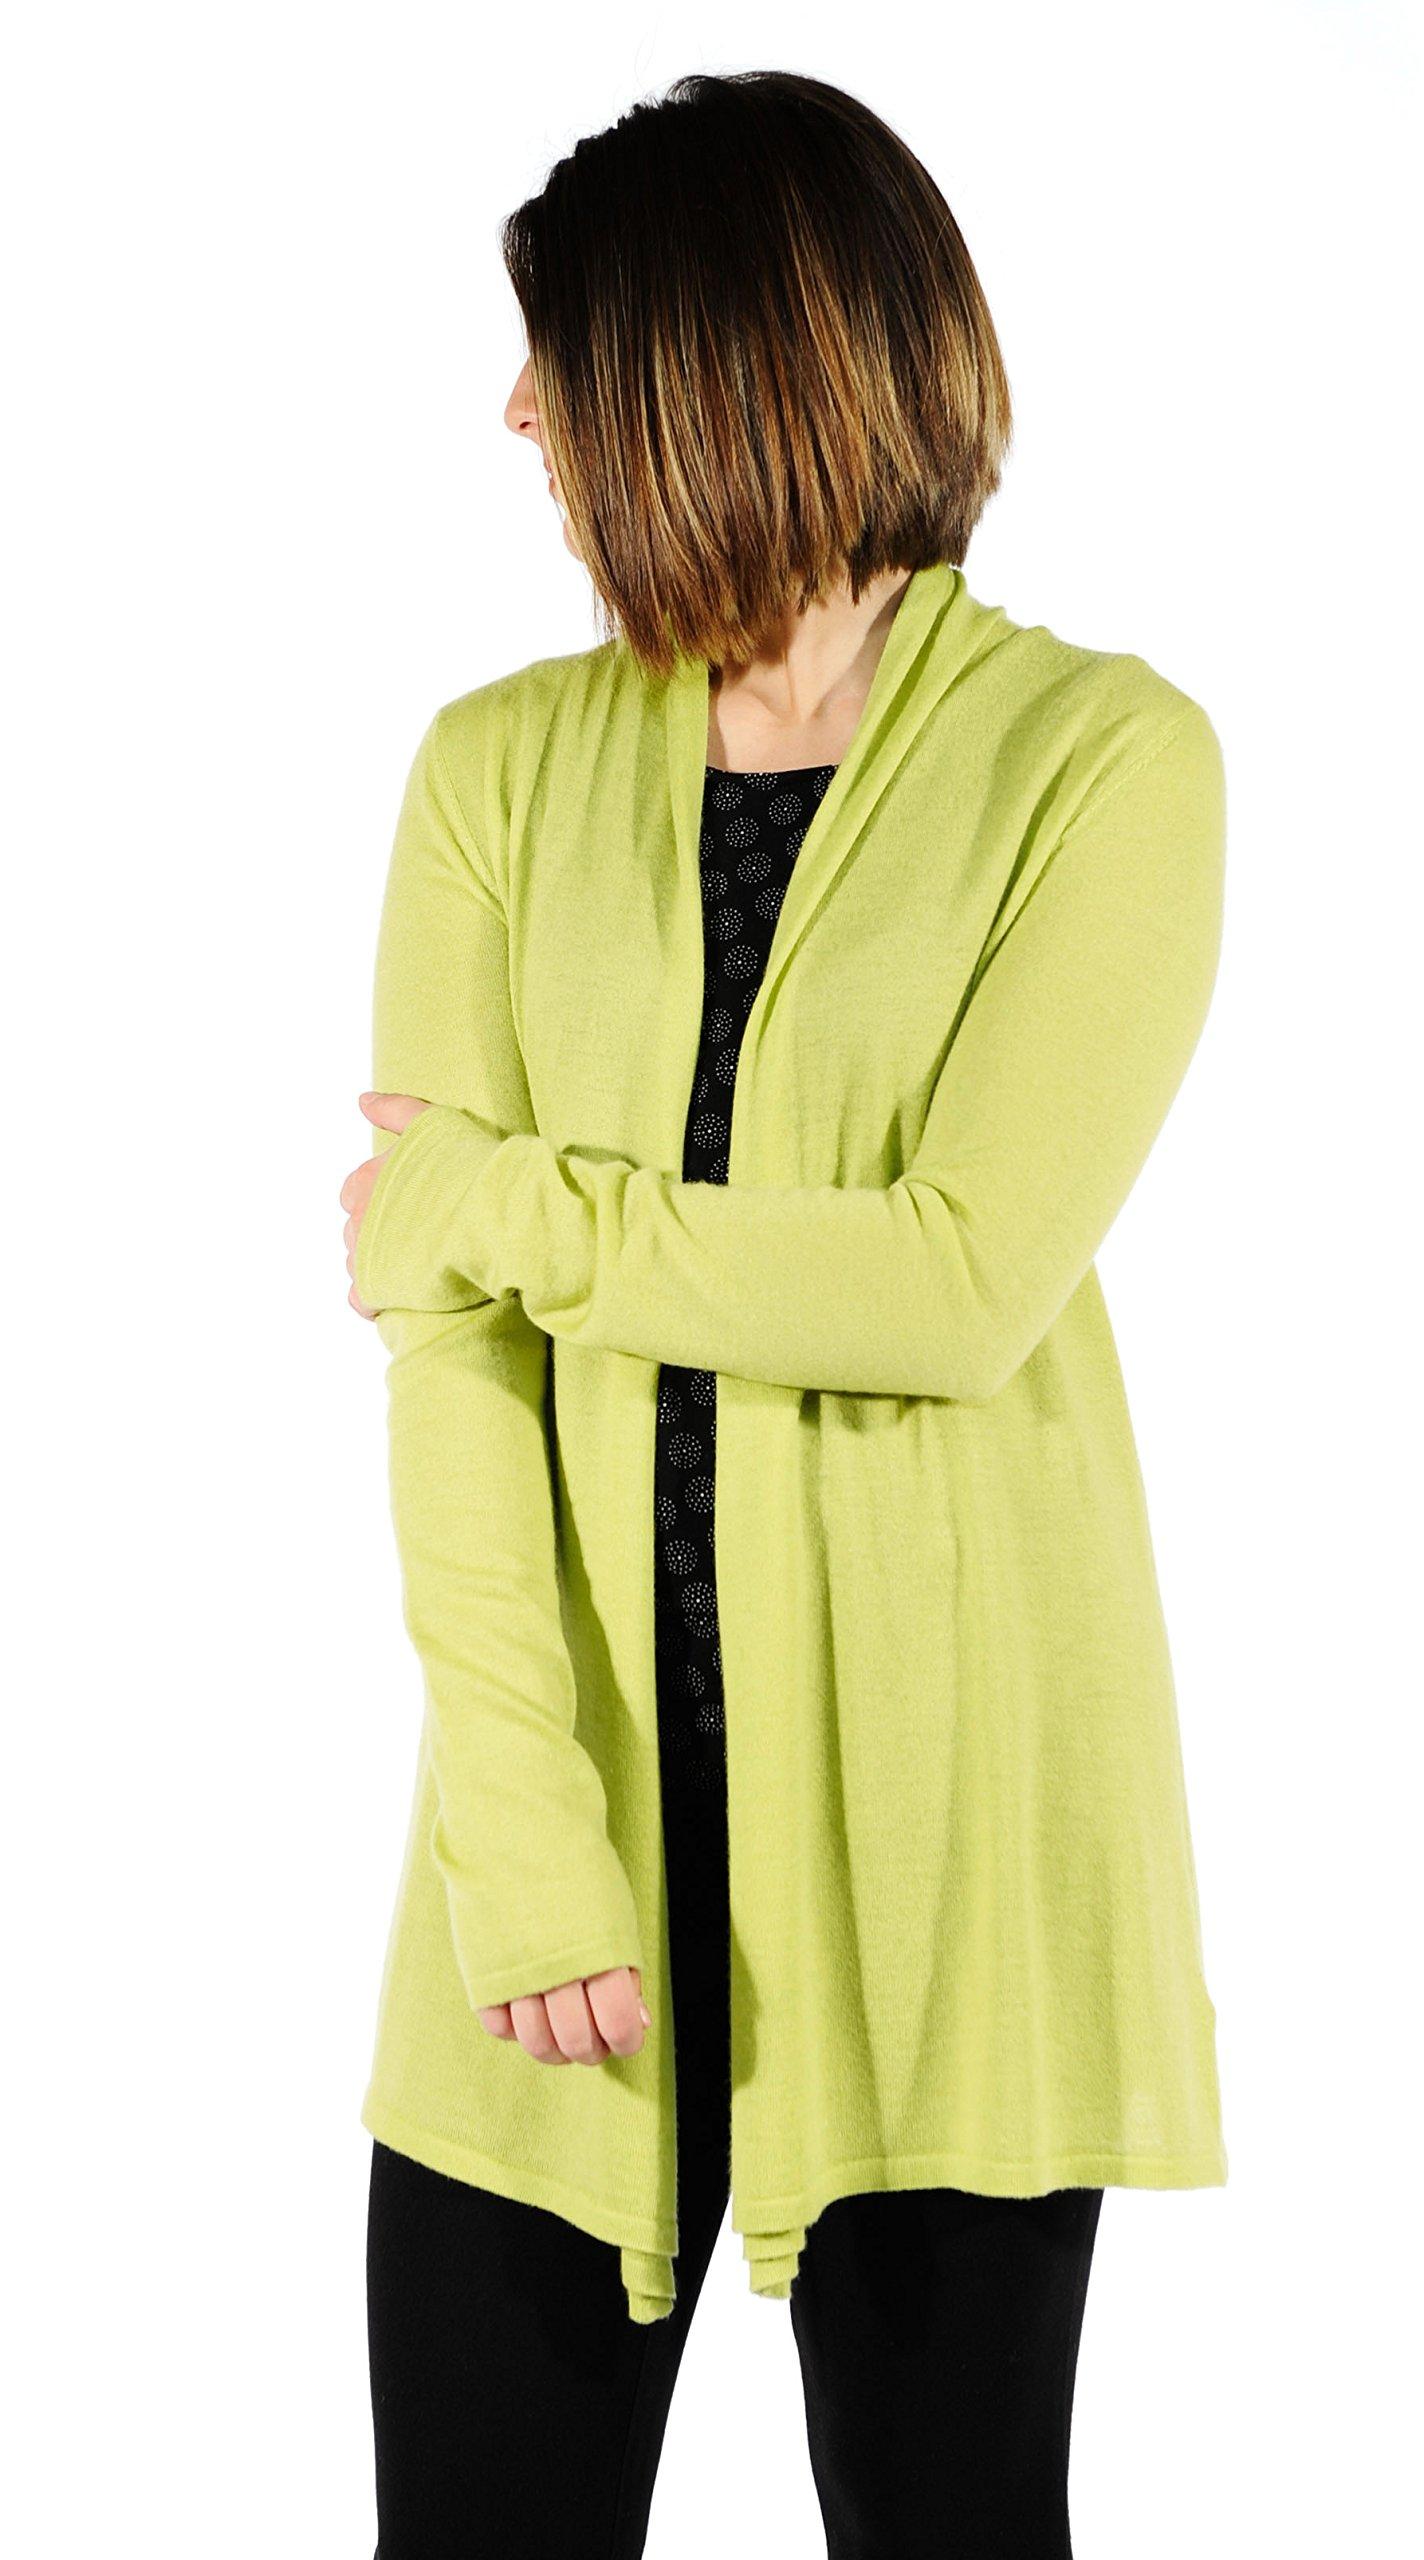 Gigi Reaume 100% Cashmere Women's Sweater, Open Front Long Cardigan, Swing Style, Ultra Lightweight (Medium, Lime)